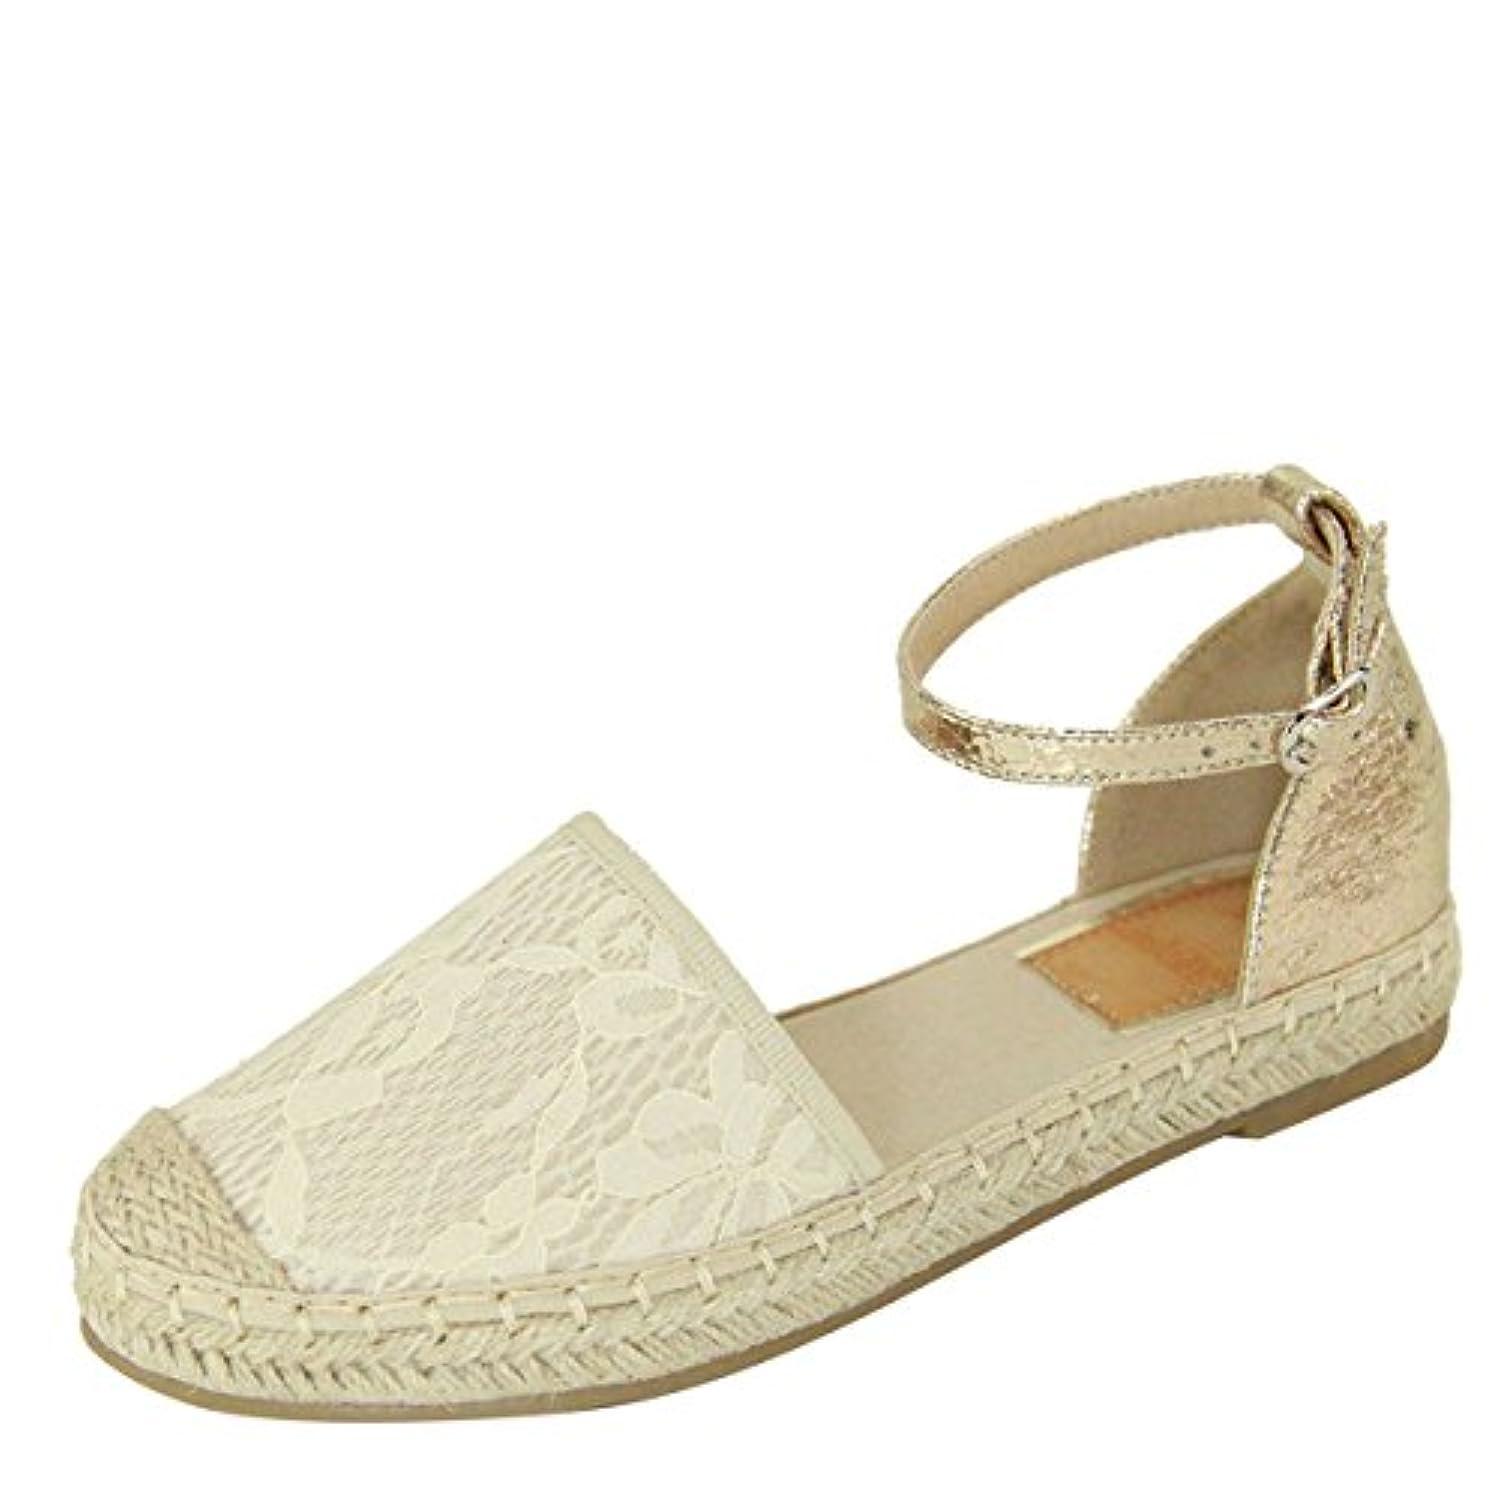 Womens Closed Toe Ankle Strap Espadrille Low Flat Platform Wedge Heel Sandal Slides Shoe